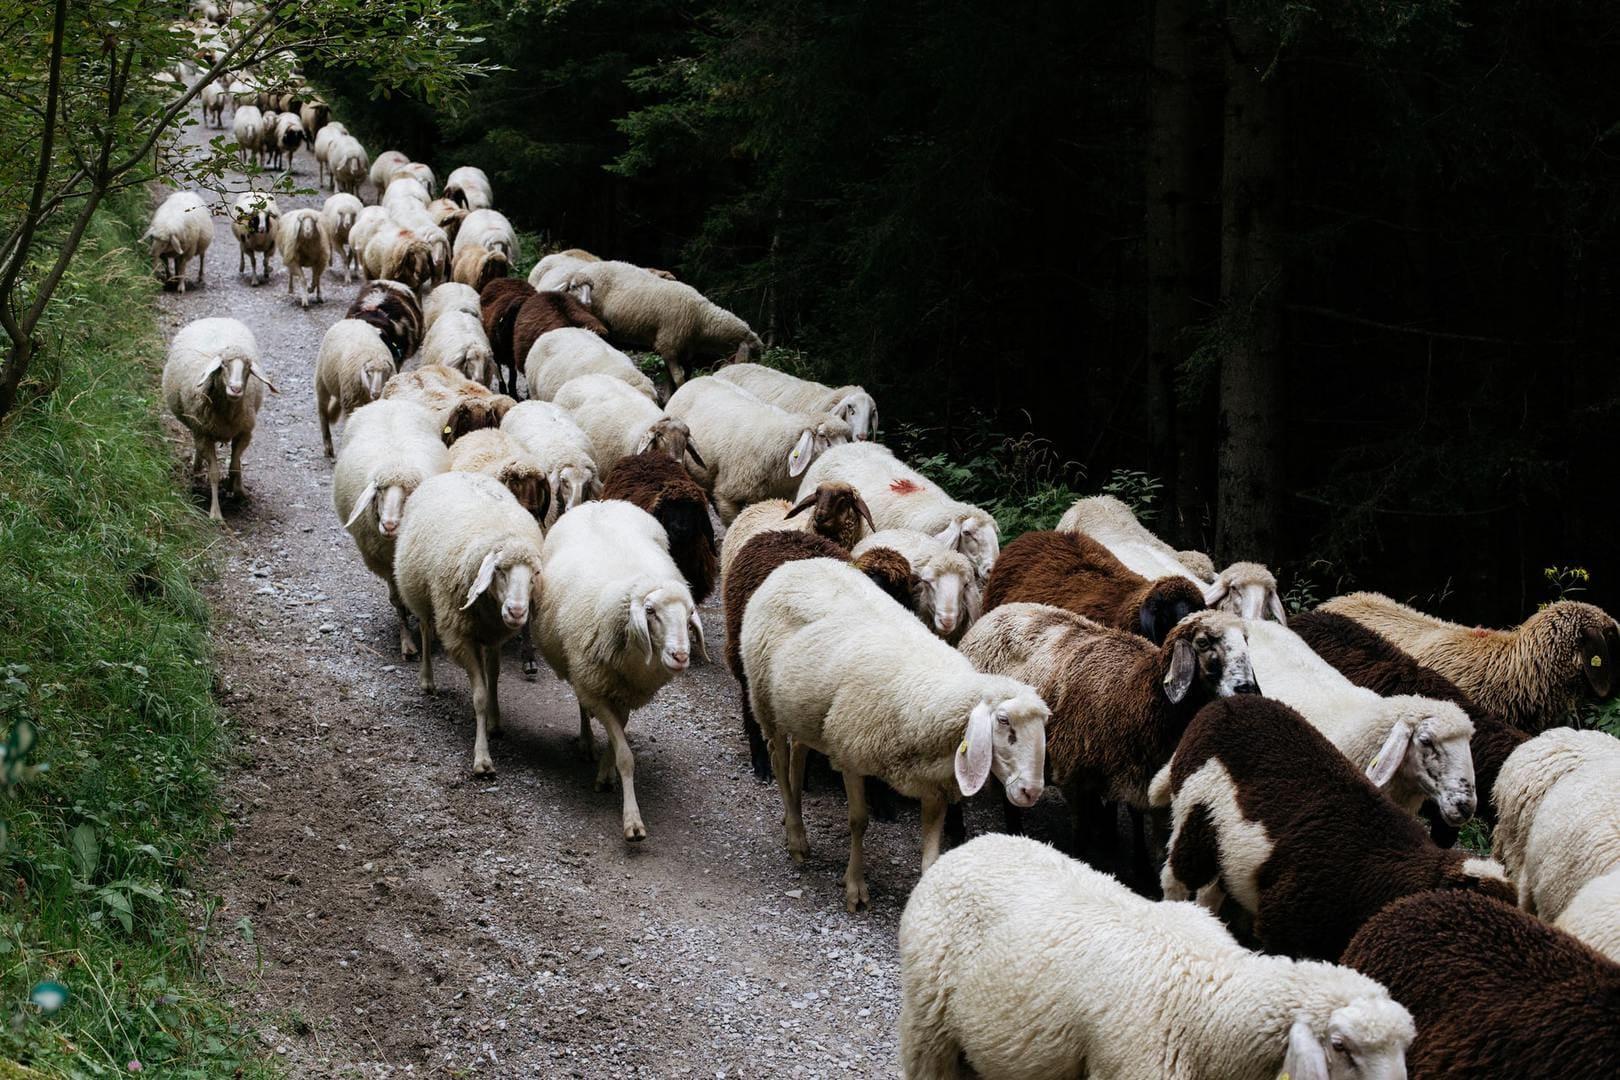 Shepherding, Policing, and Transforming Everything